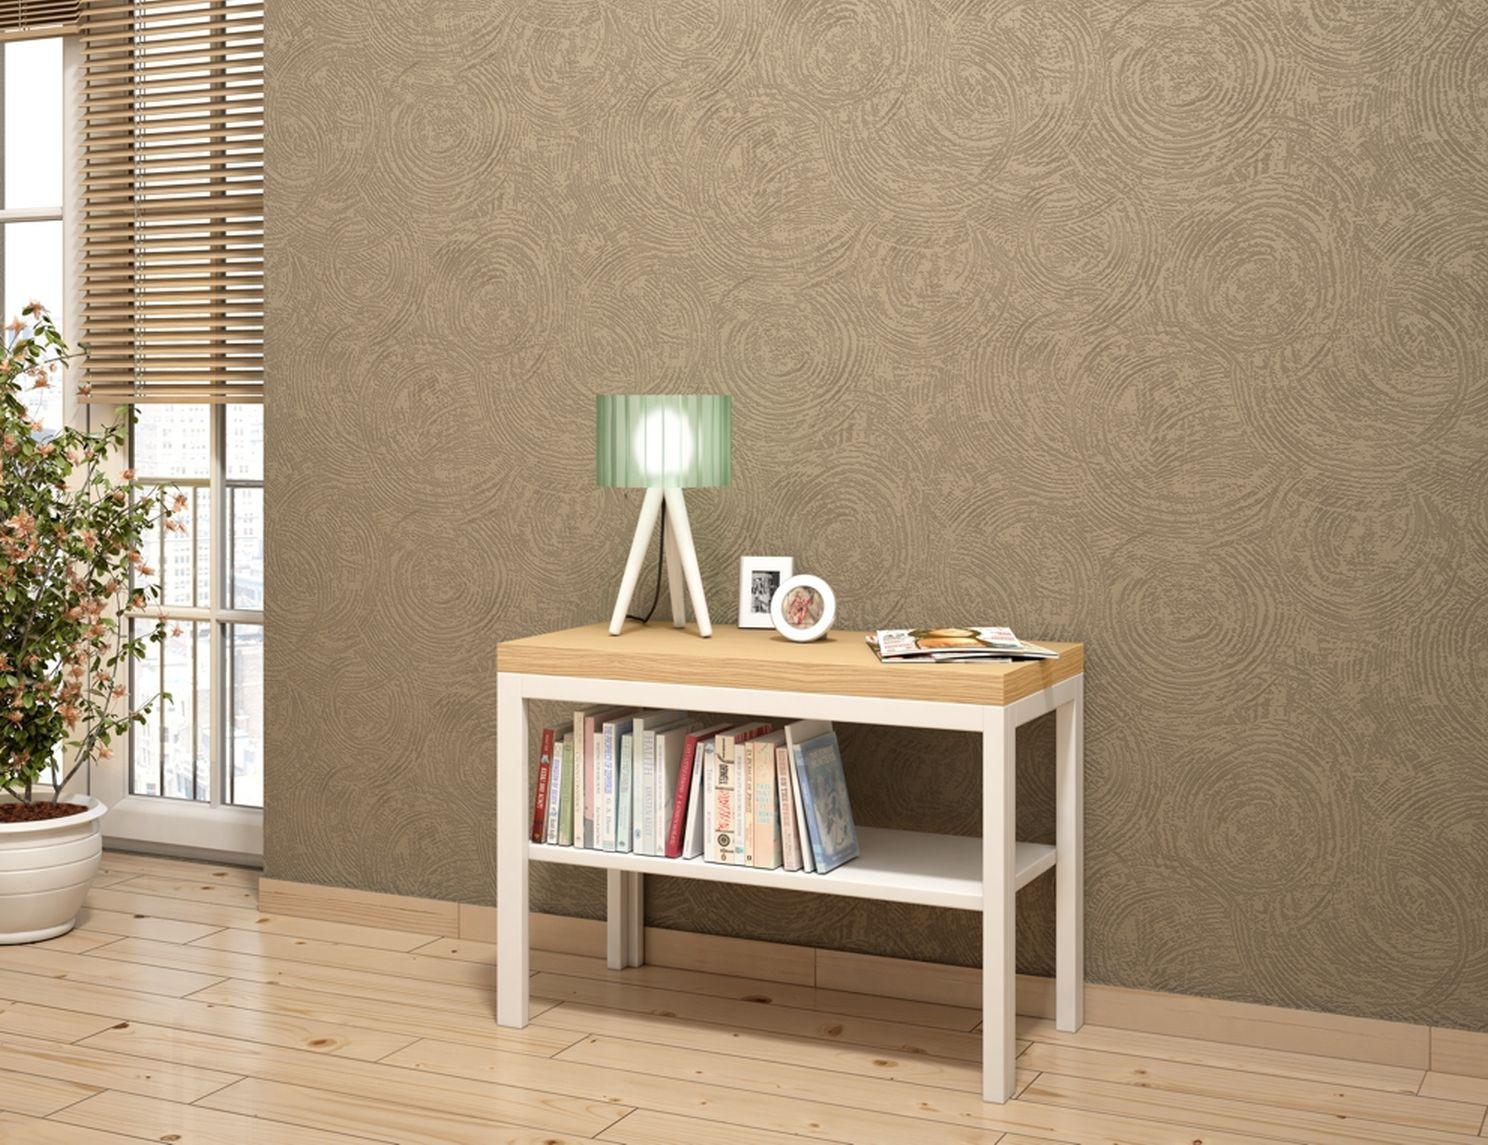 vlies tapete berstreichbar kreise rasch wallton 125207. Black Bedroom Furniture Sets. Home Design Ideas